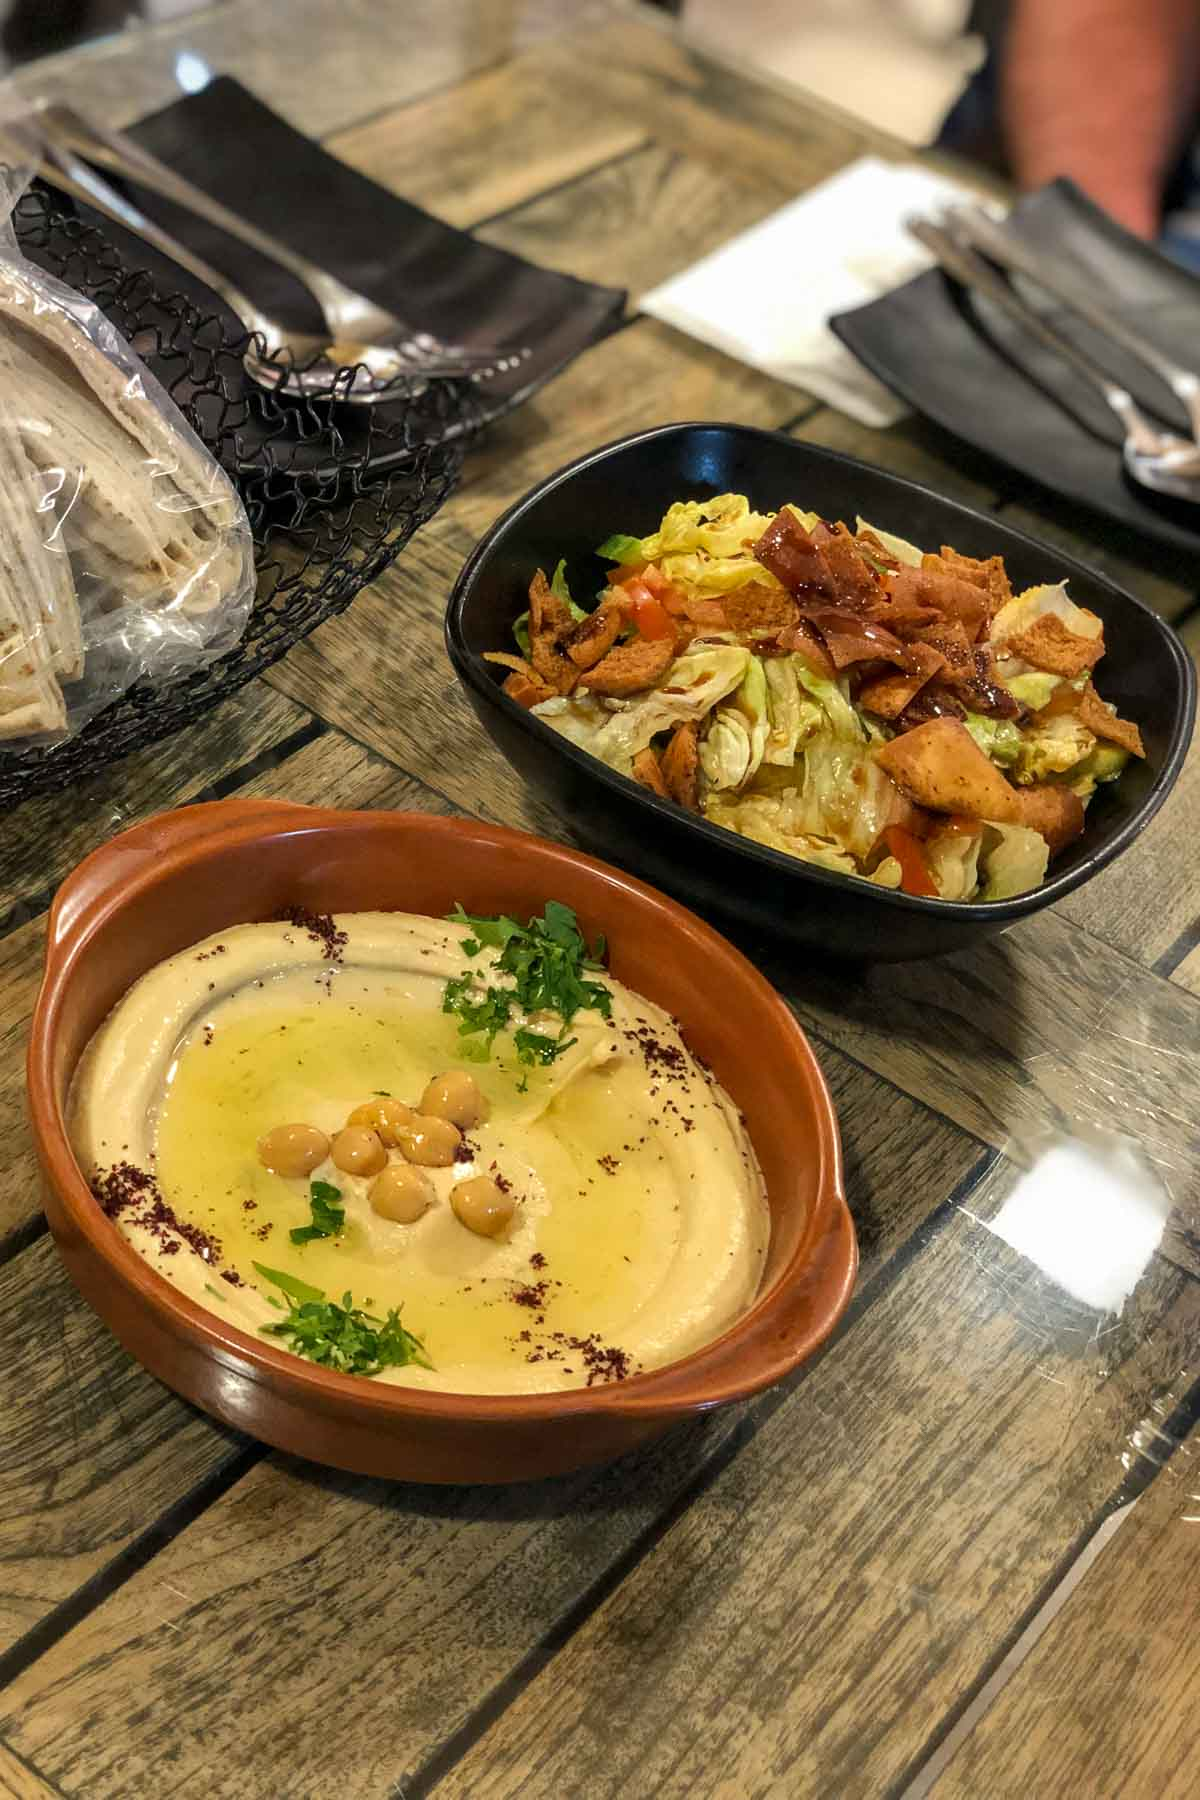 Dinner at the Khubza & Seneya in Aqaba, Jordan